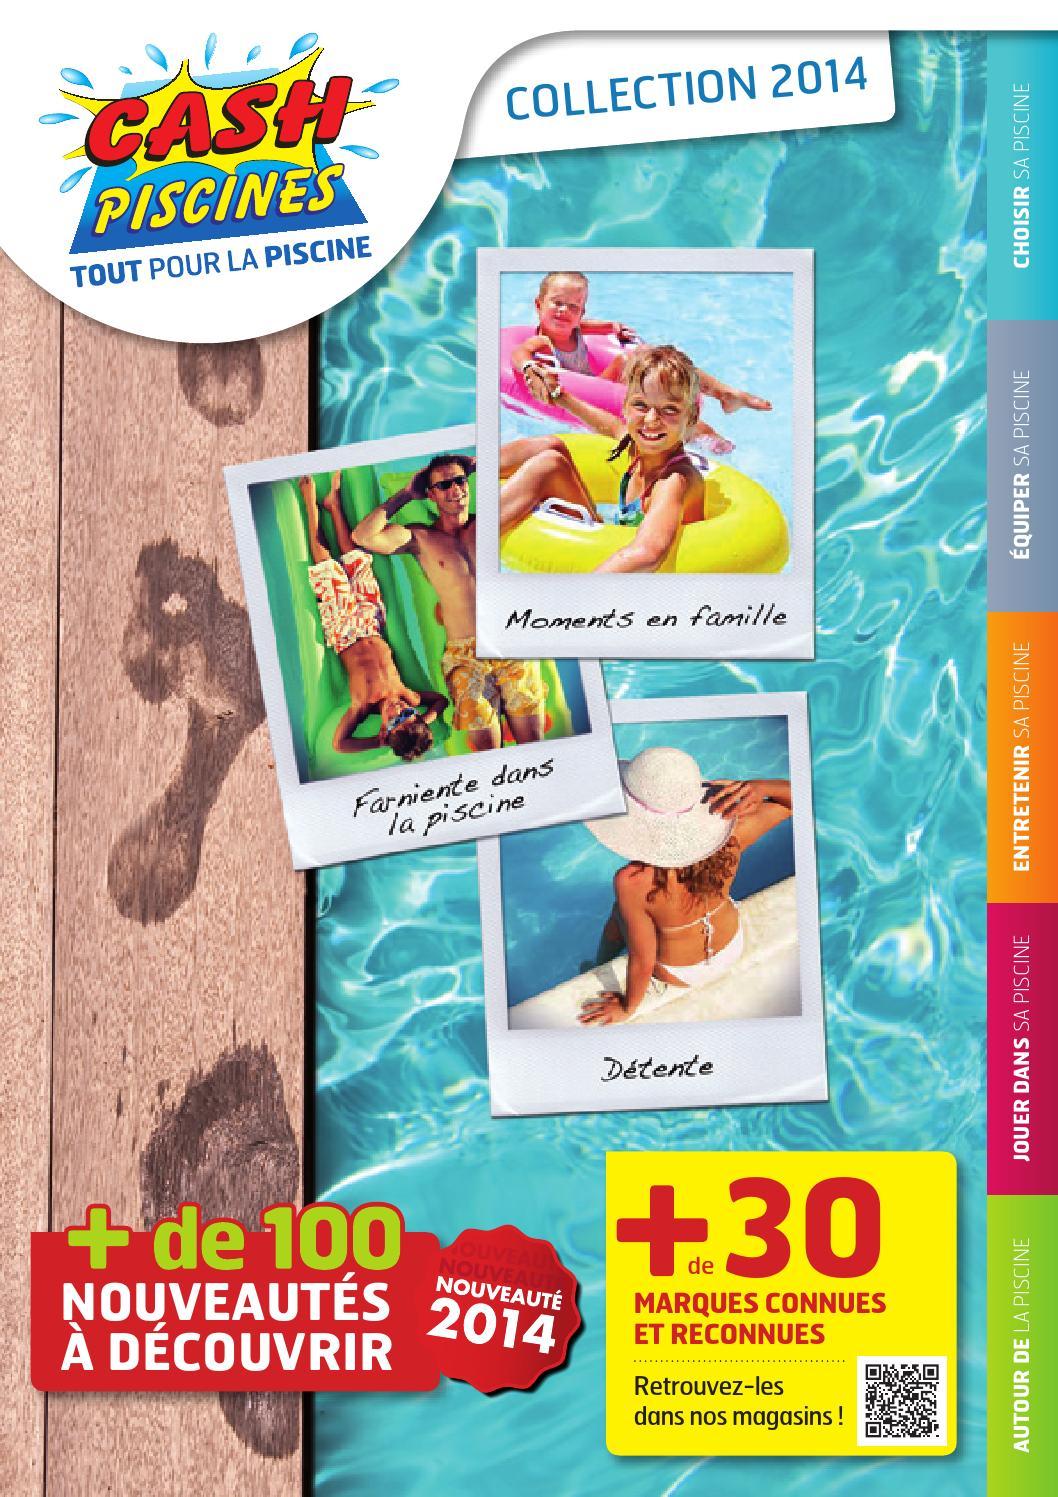 Cash Piscines Catalogue 2014 By Octave Octave - Issuu serapportantà Cash Piscine Brive